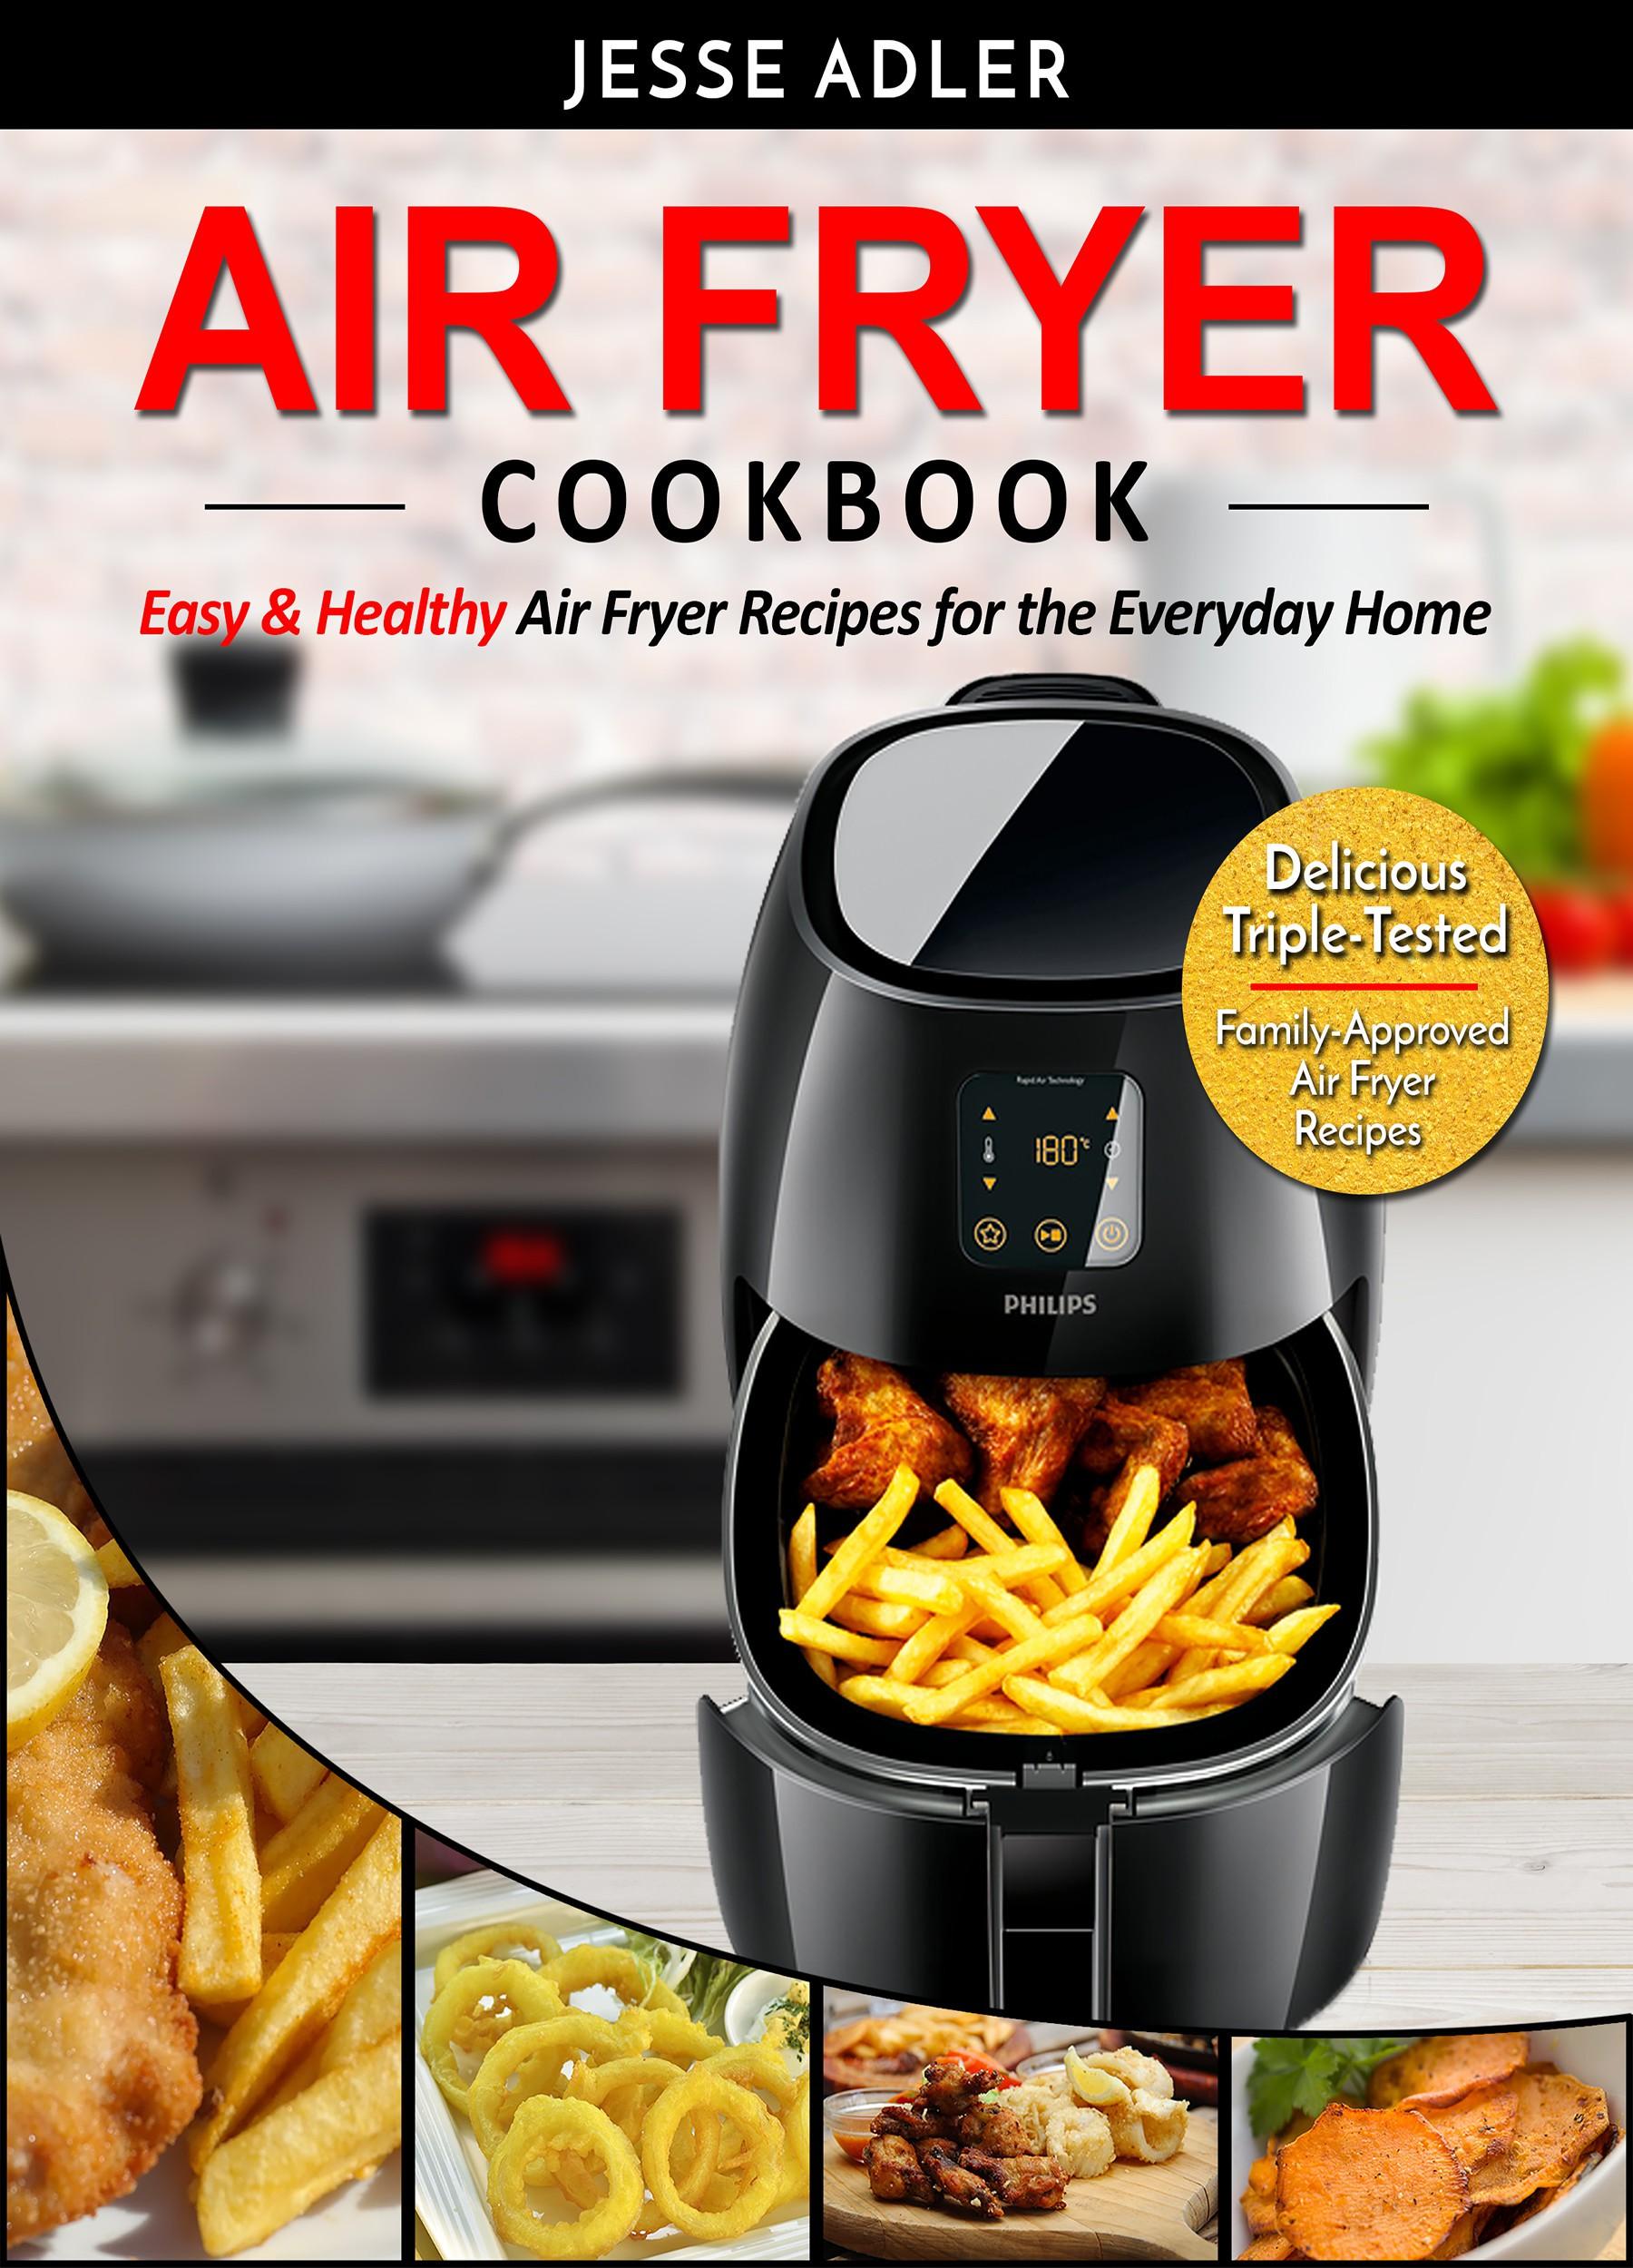 Air Fryer Cookbook - Book Cover!